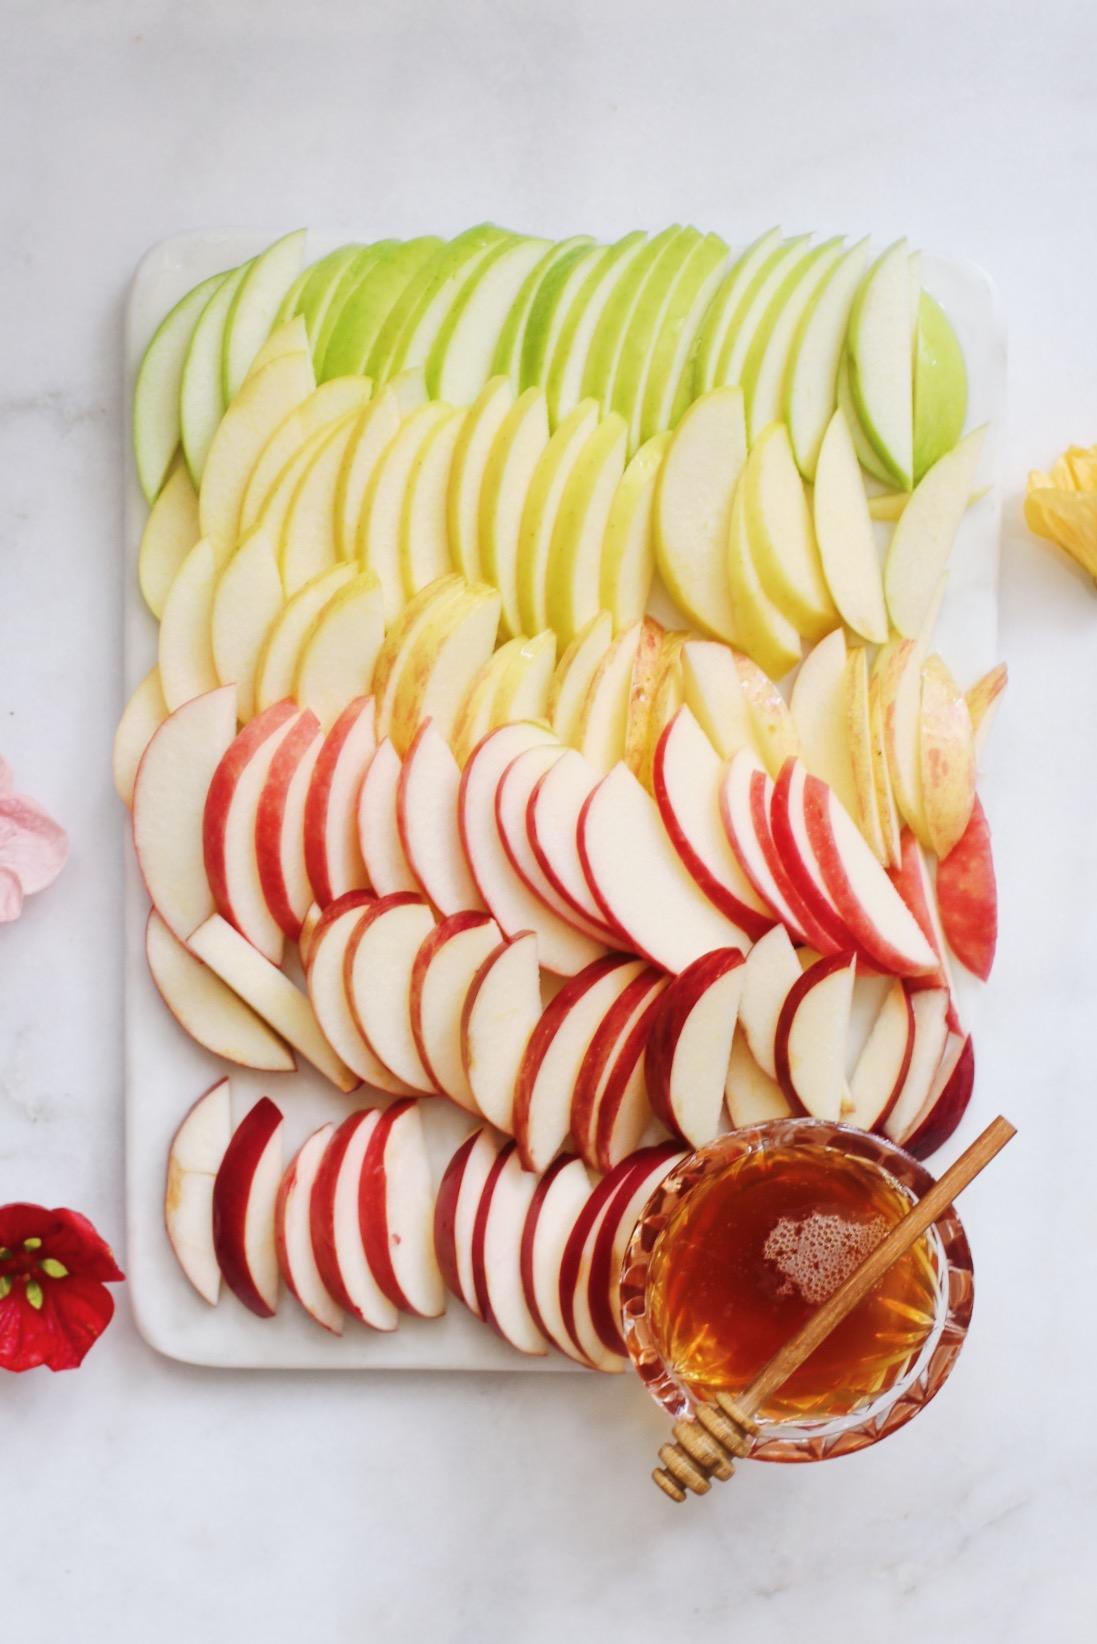 Colorful apples Rainbow apples